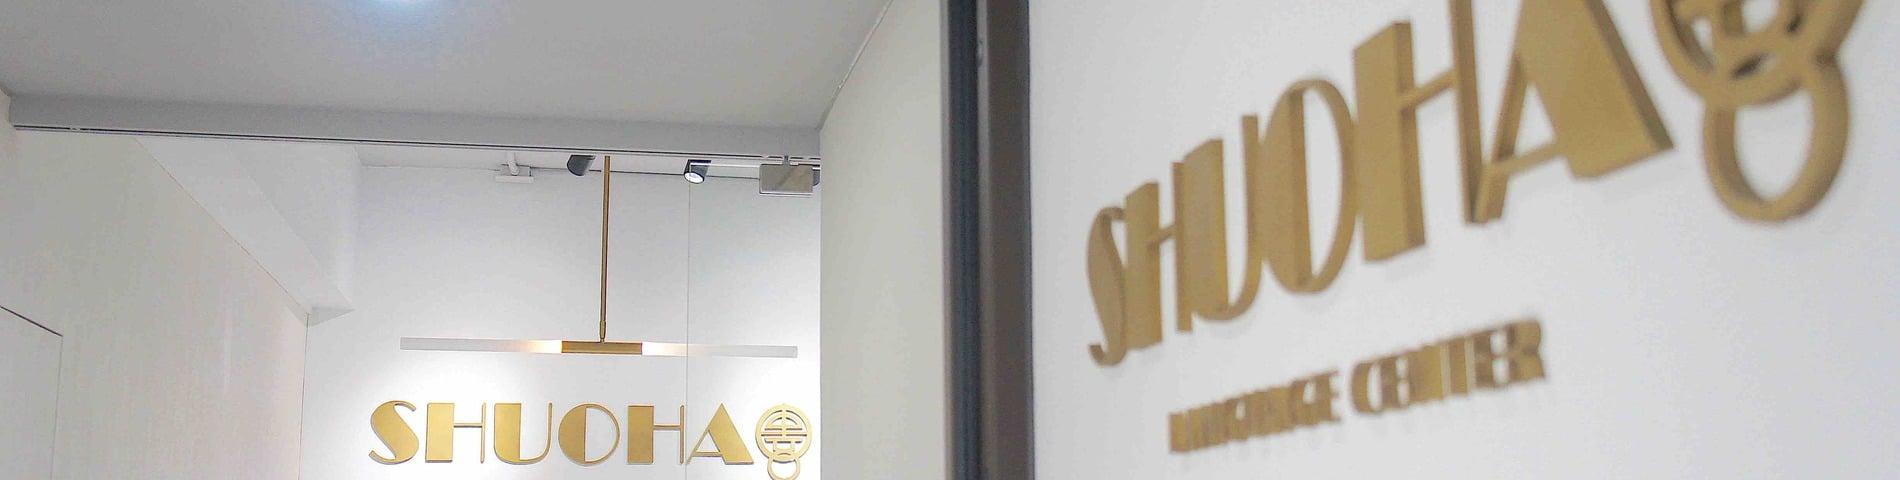 ShuoHao Language Center picture 1